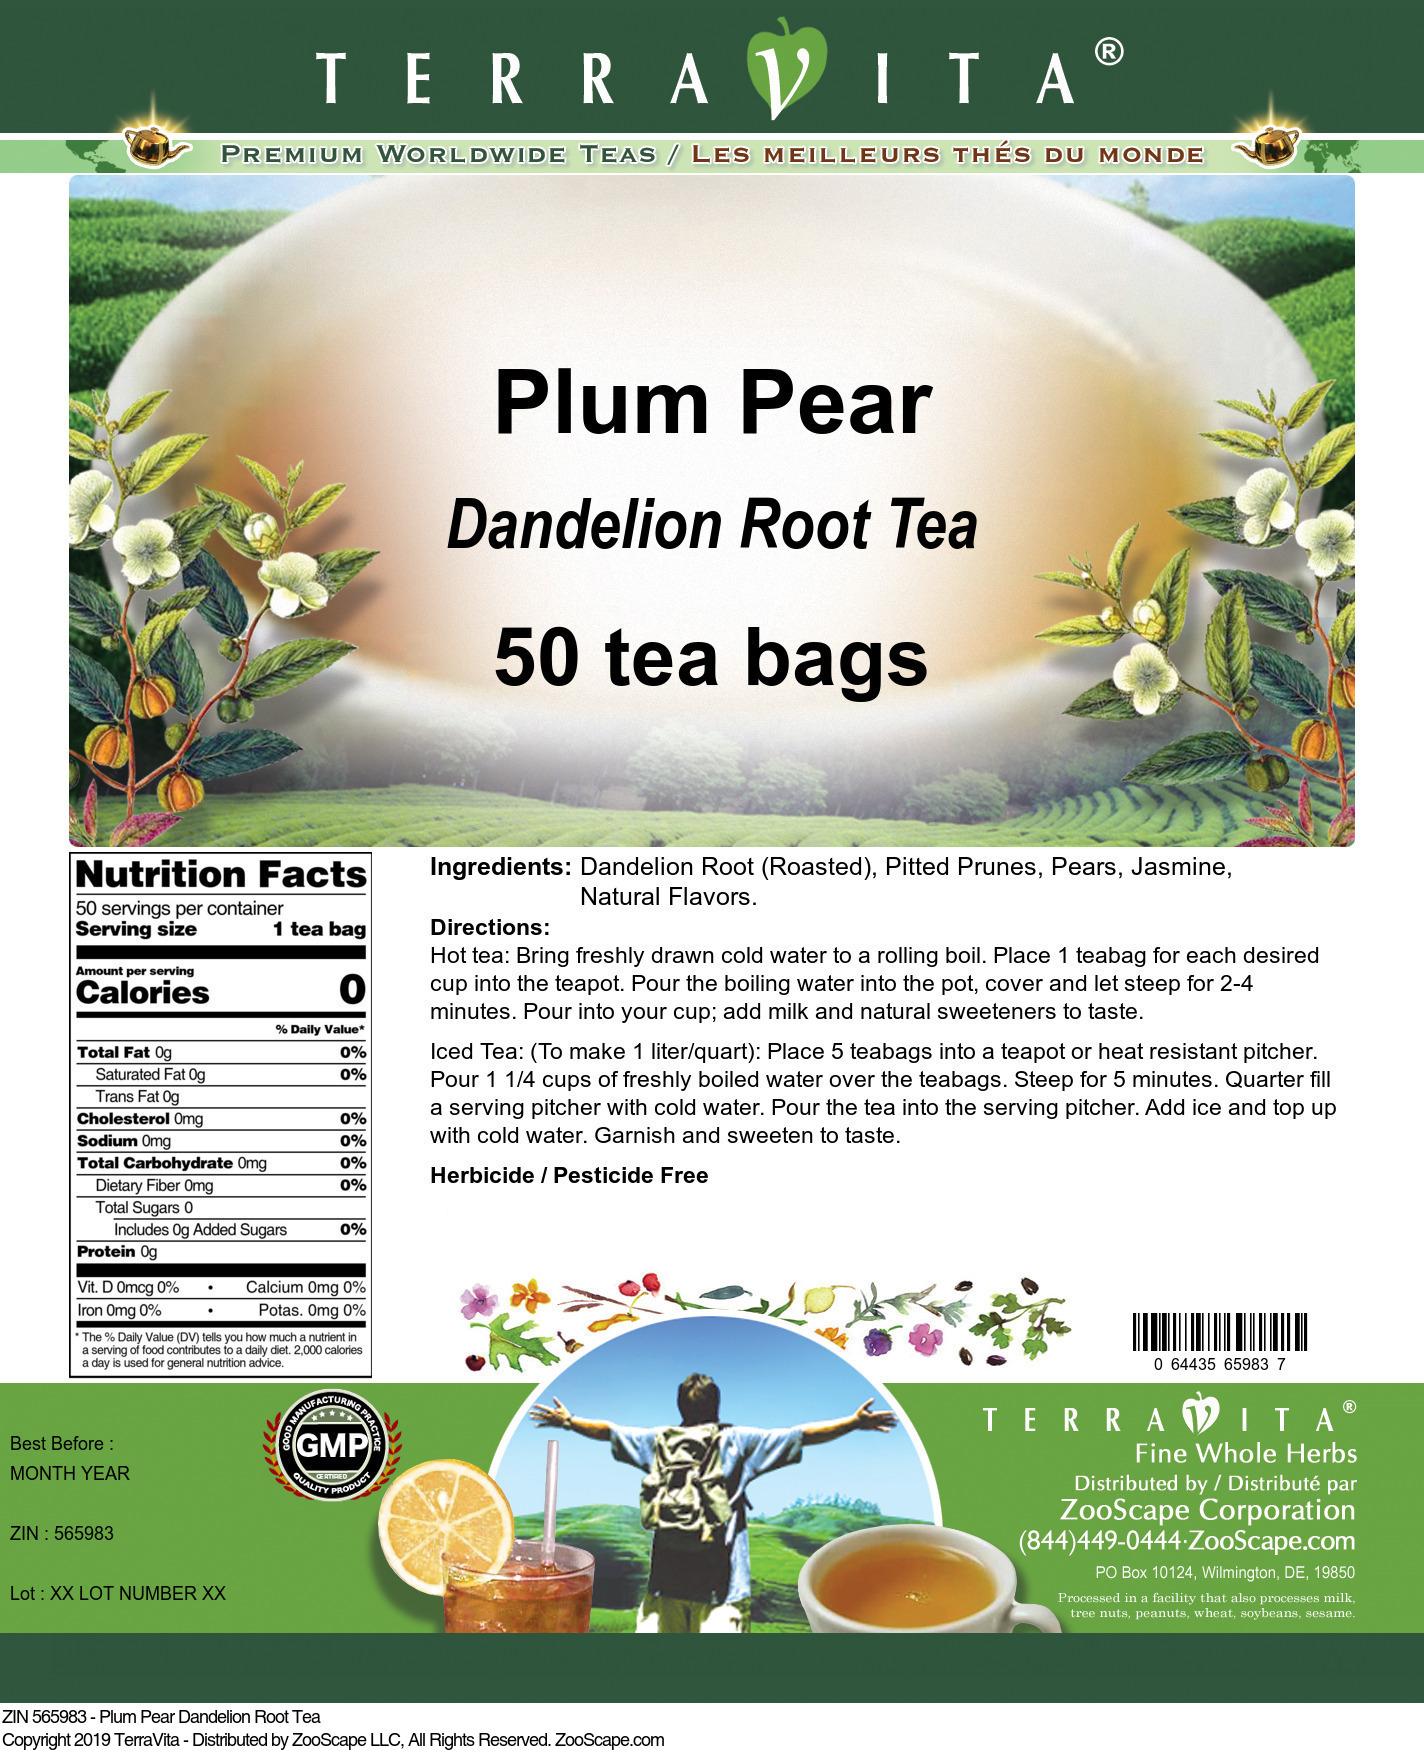 Plum Pear Dandelion Root